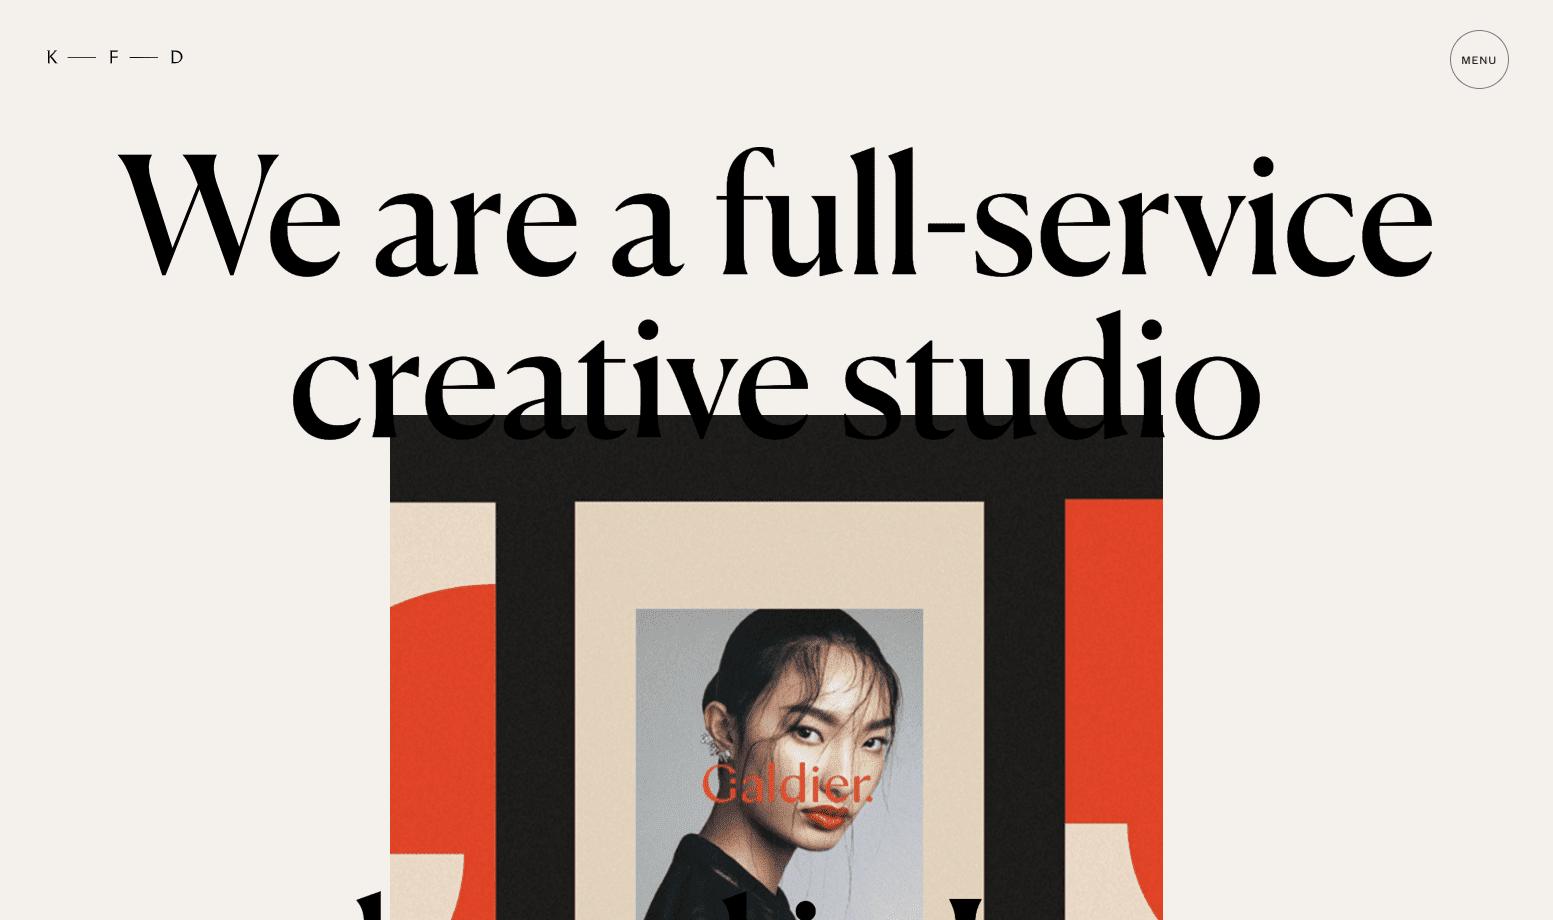 Kati Forner's portfolio website